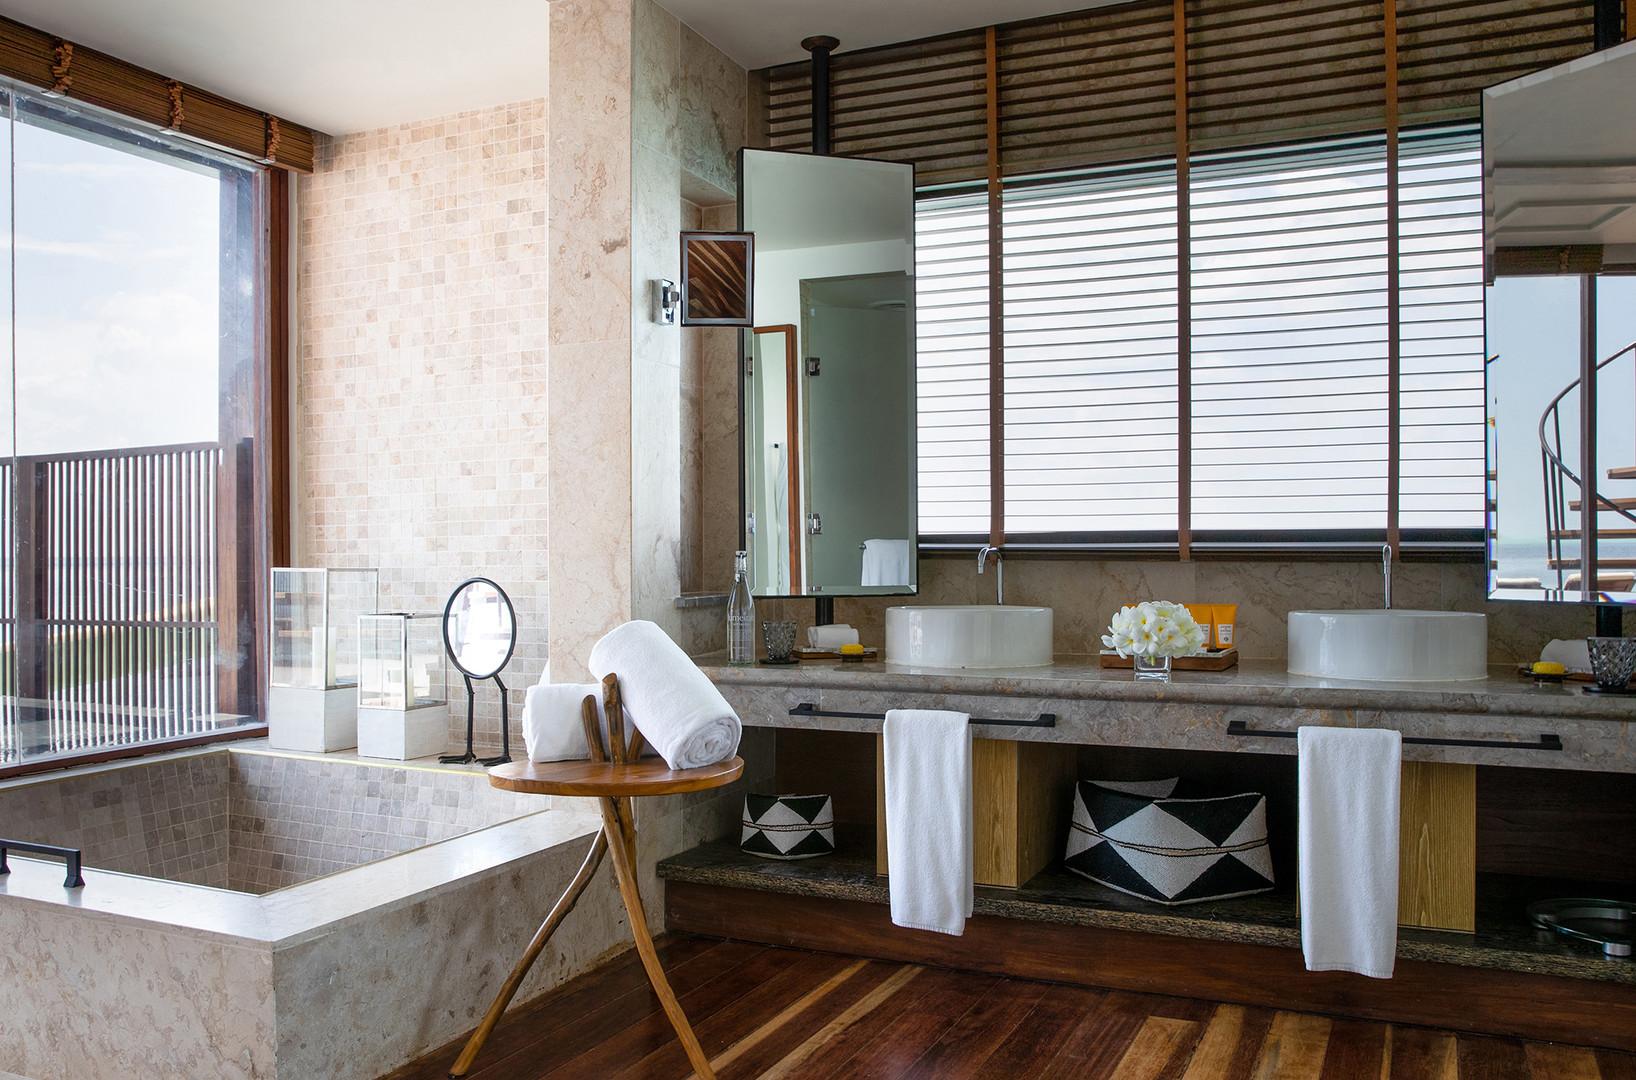 OZEN RESERVE BOLIFUSHI - Private Ocean RESERVE with Slide - Bathroom